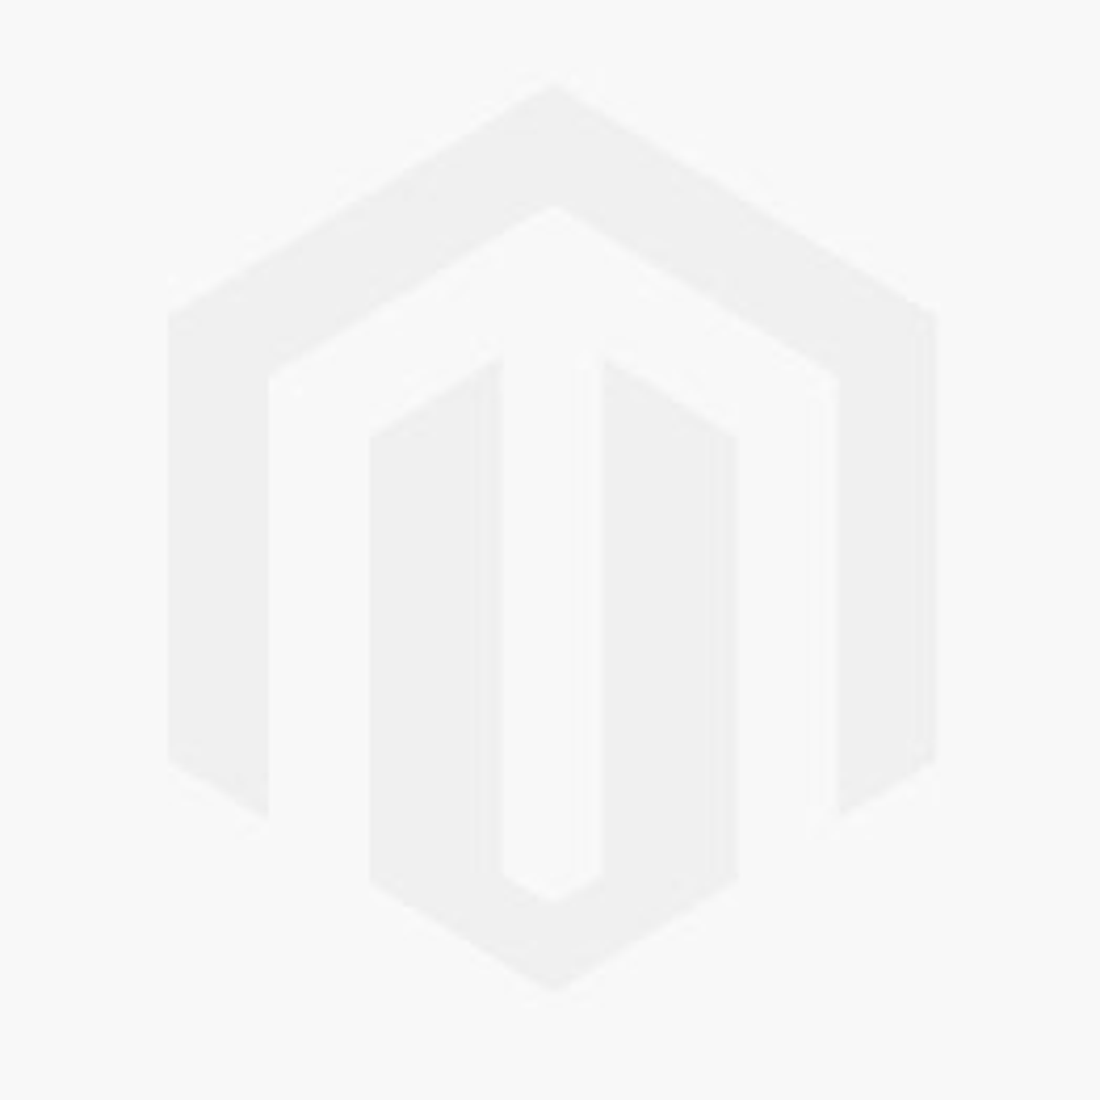 Leon Spilliaert Self-portrait Mantlepiece Card